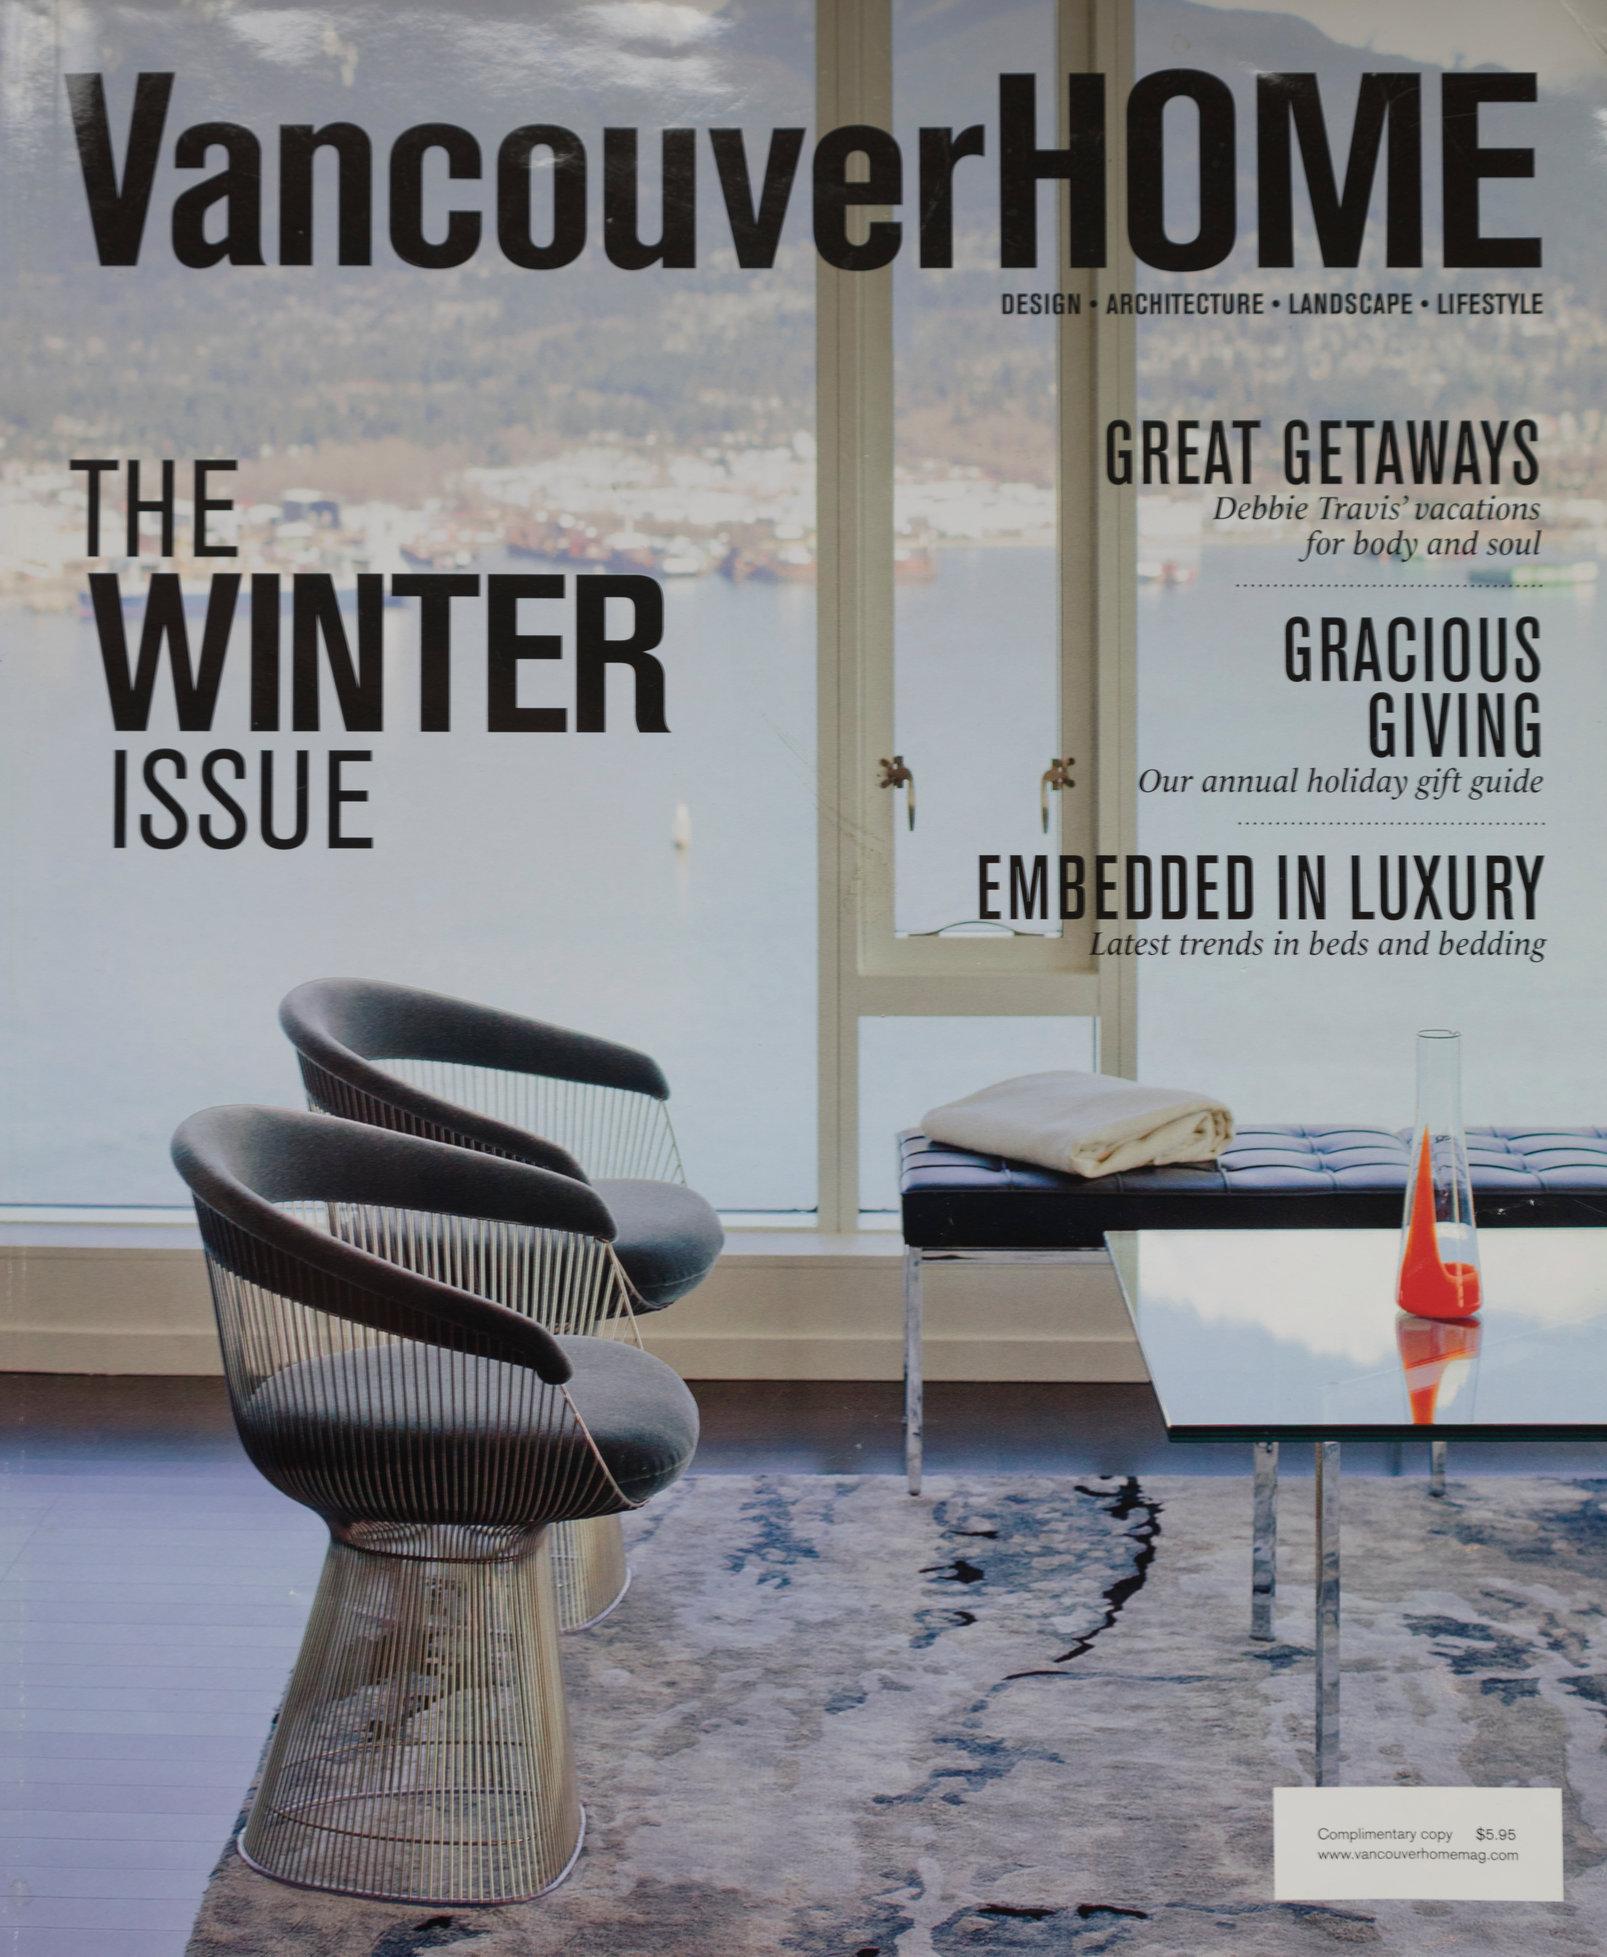 VancouverHome.jpg